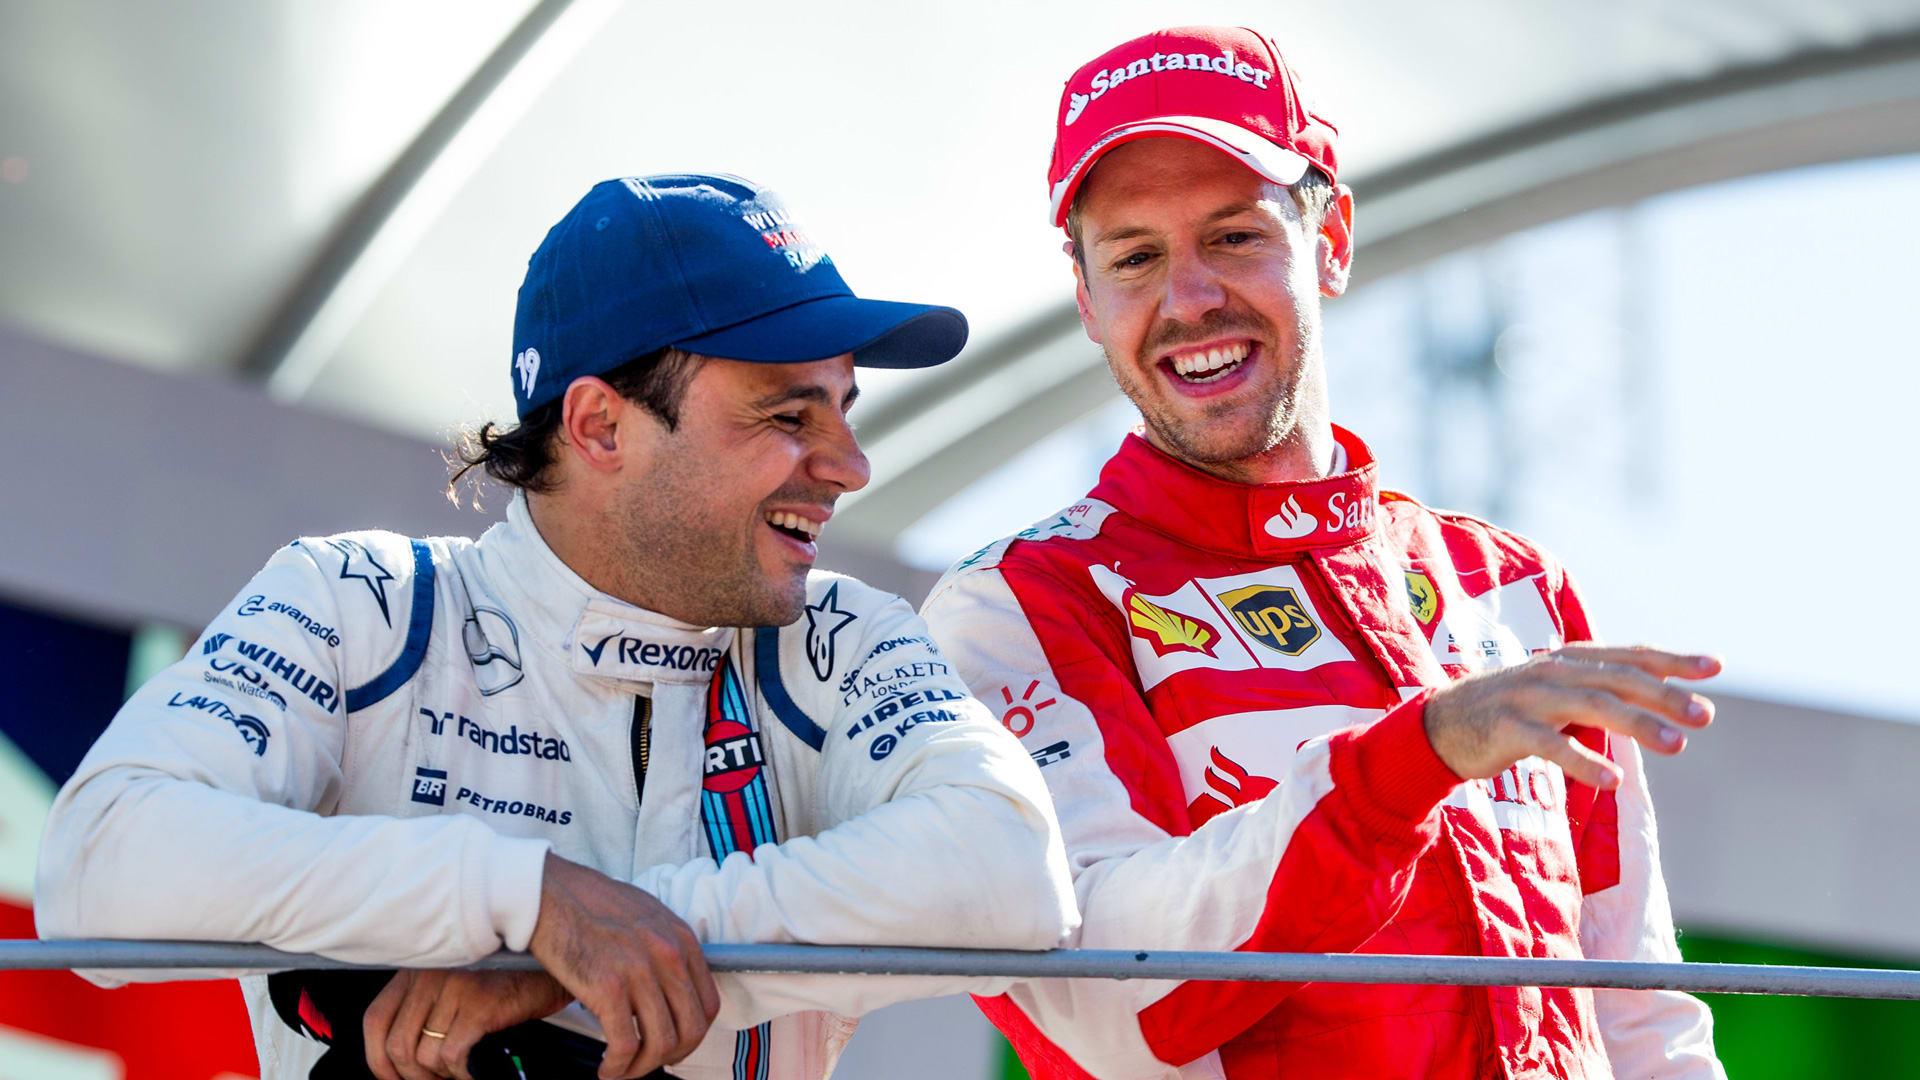 'I'm not surprised Vettel is leaving Ferrari' says Scuderia race winner Massa | Formula 1®